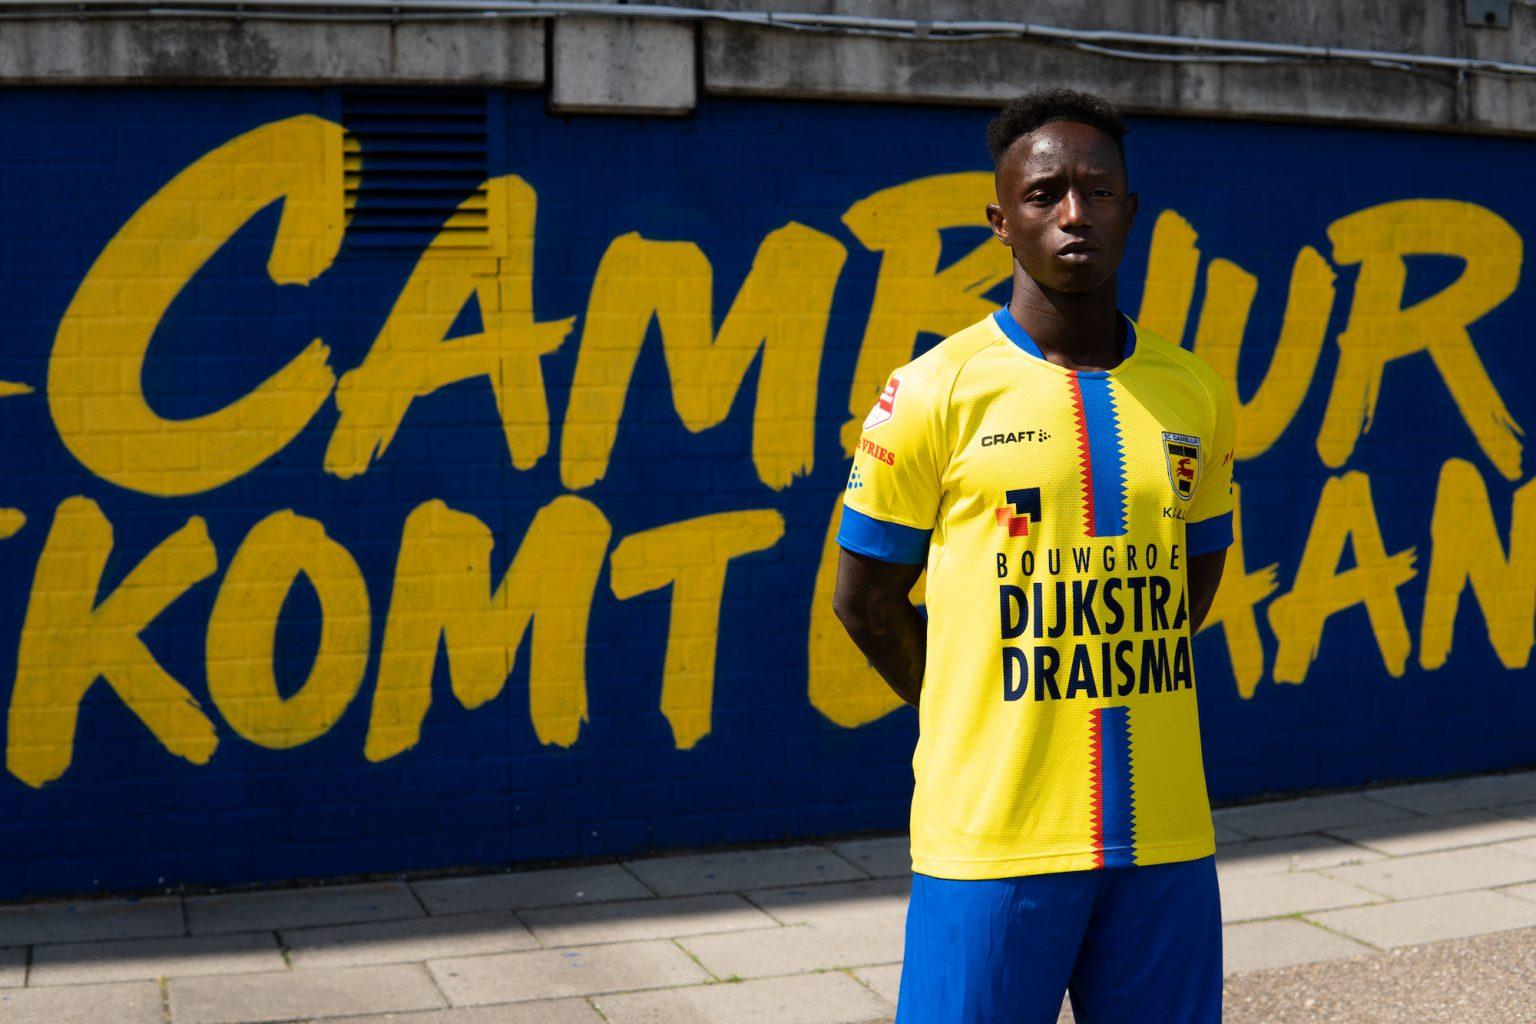 Sc Cambuur Voetbalshirts 2020 2021 Voetbalshirts Com